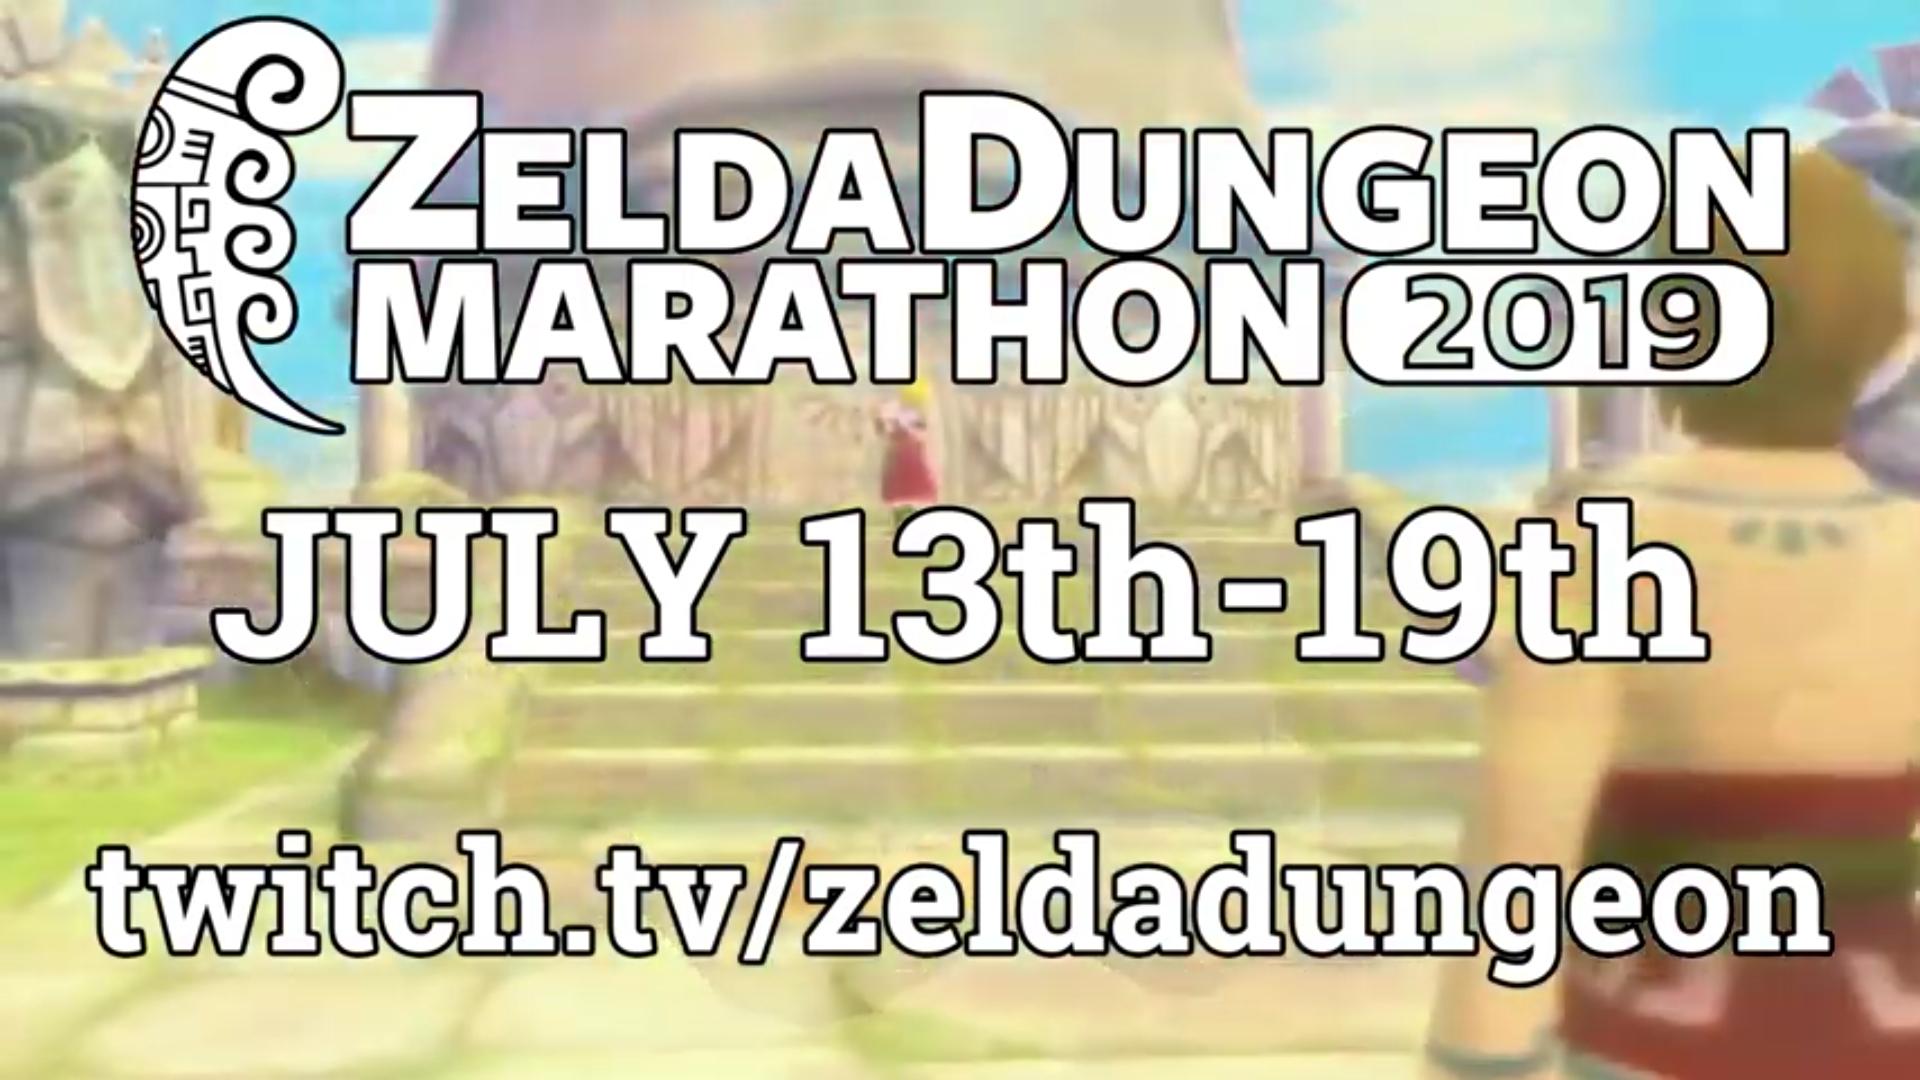 Join Zelda Dungeon July 13th-July 19th for the 2019 Zelda Dungeon Marathon!